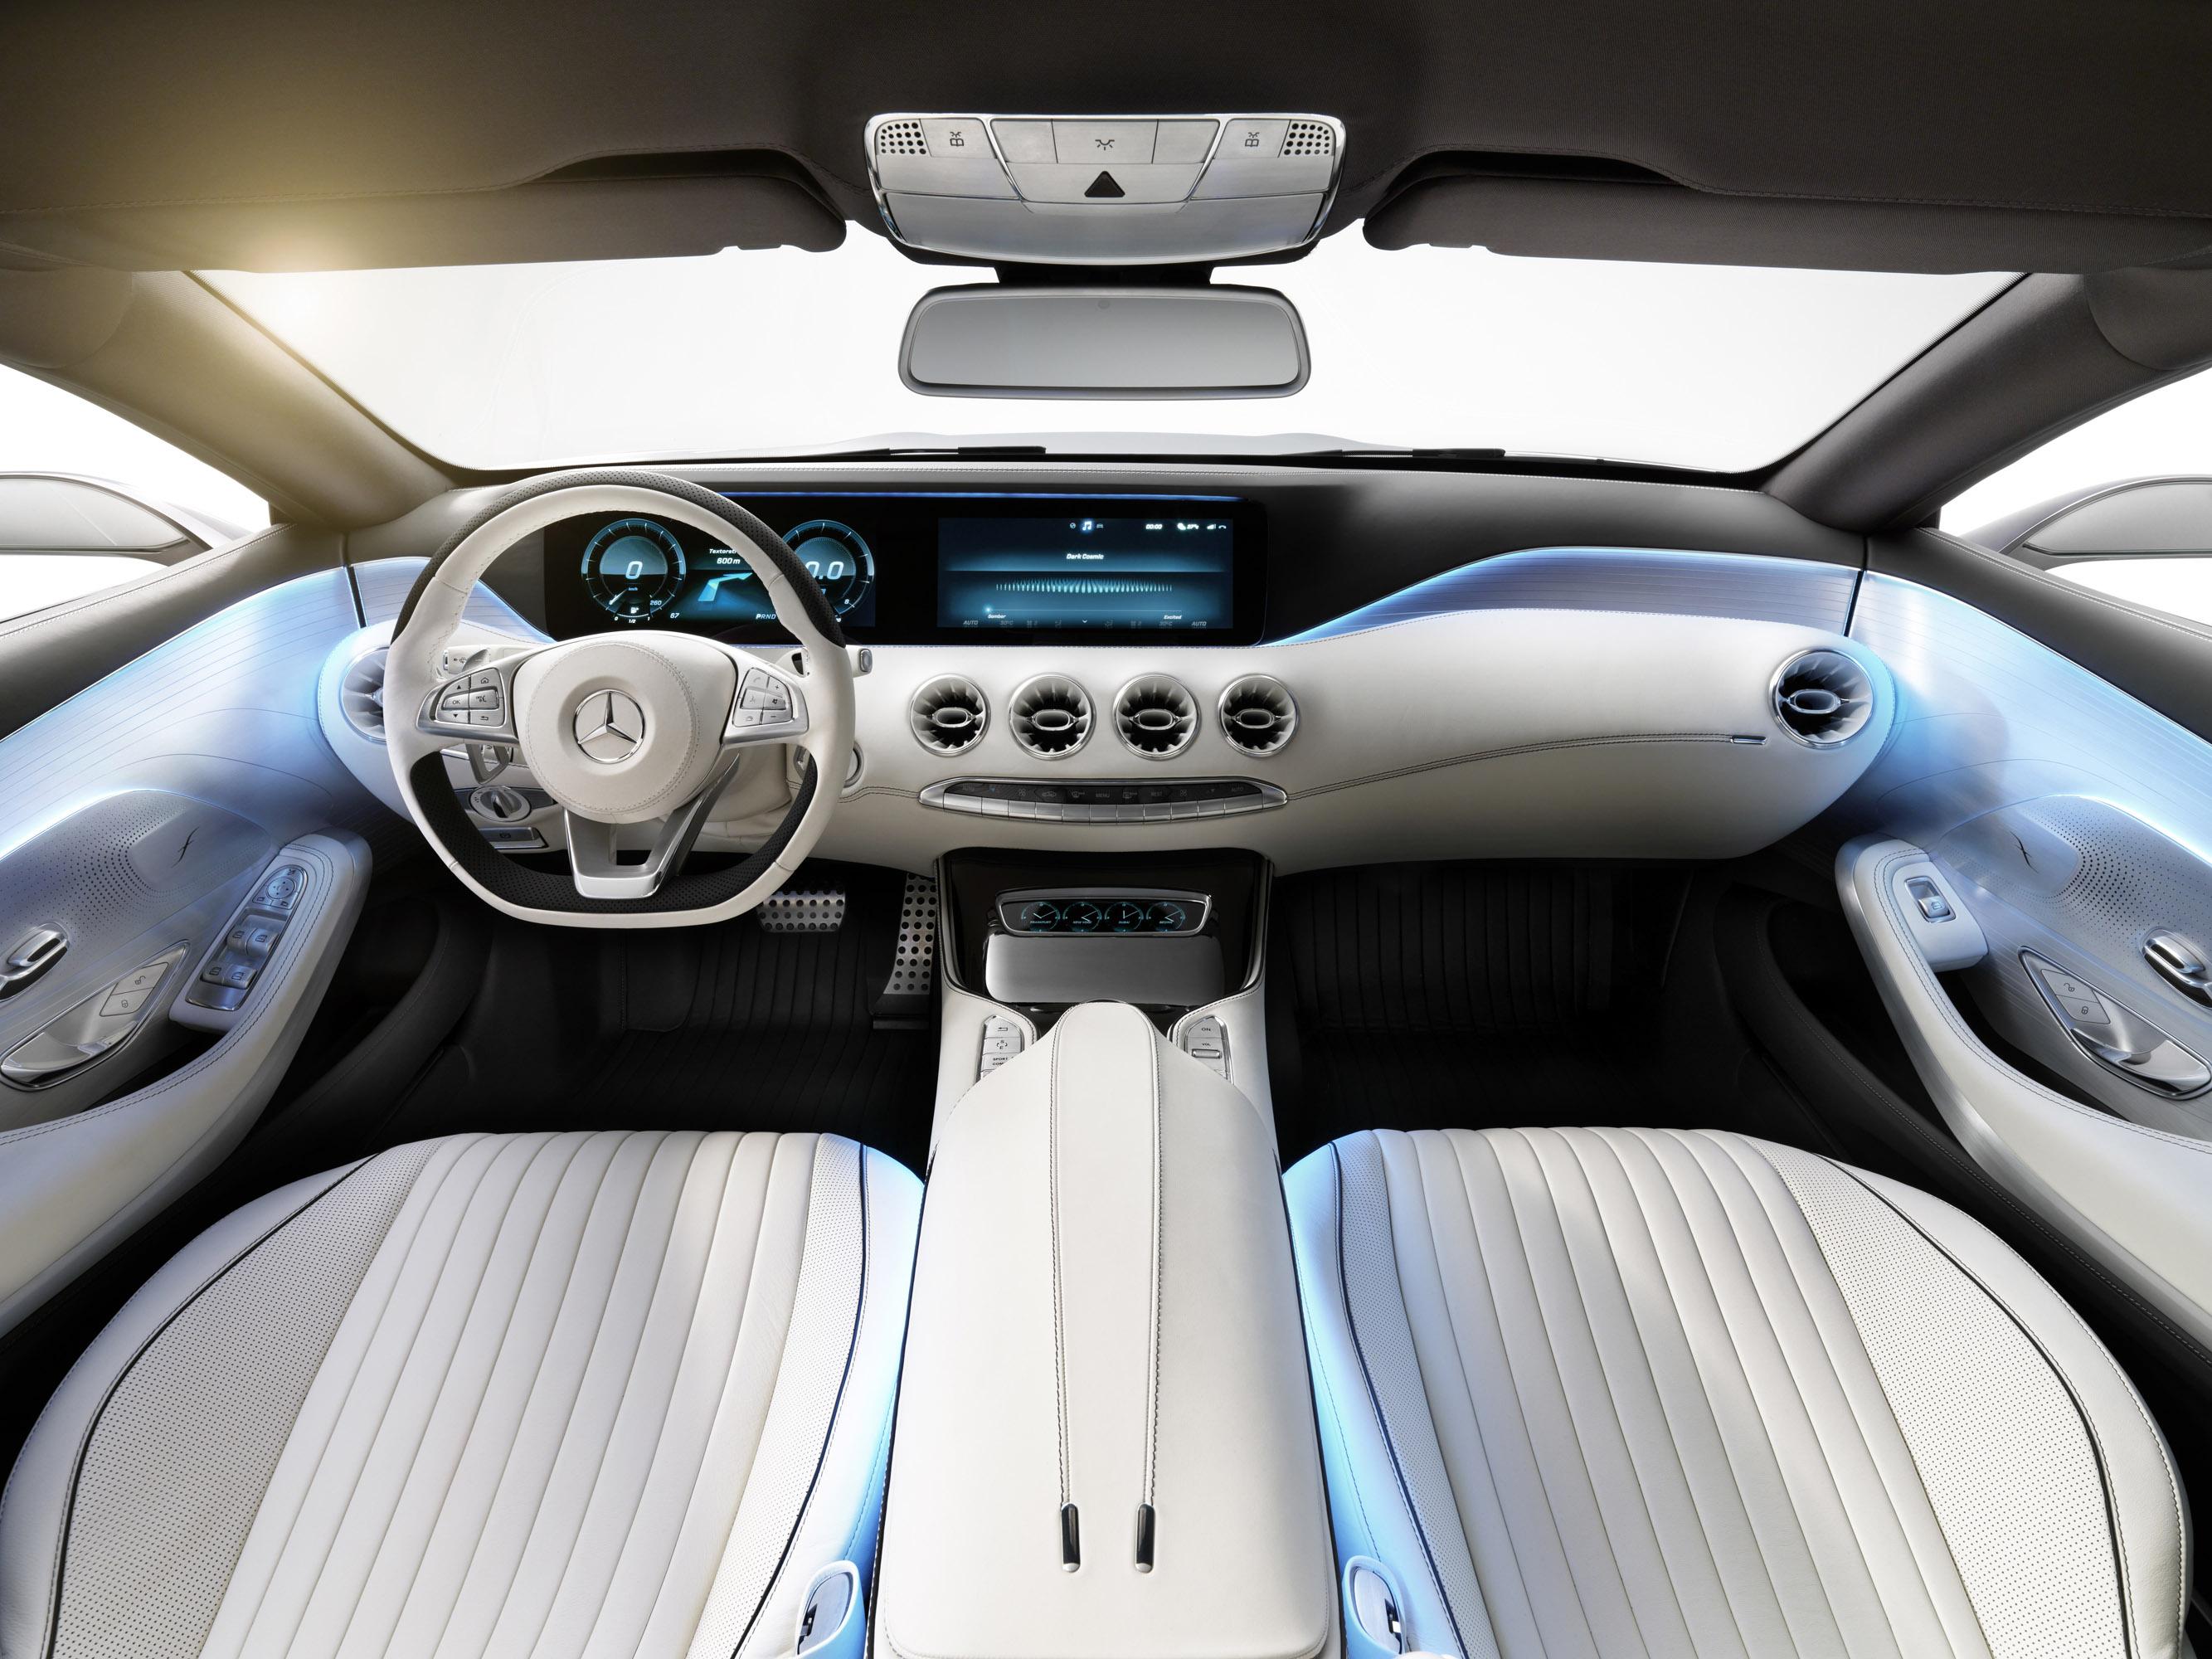 mercedes benz s class coupe concept - Mercedes Benz 2014 S Class Interior